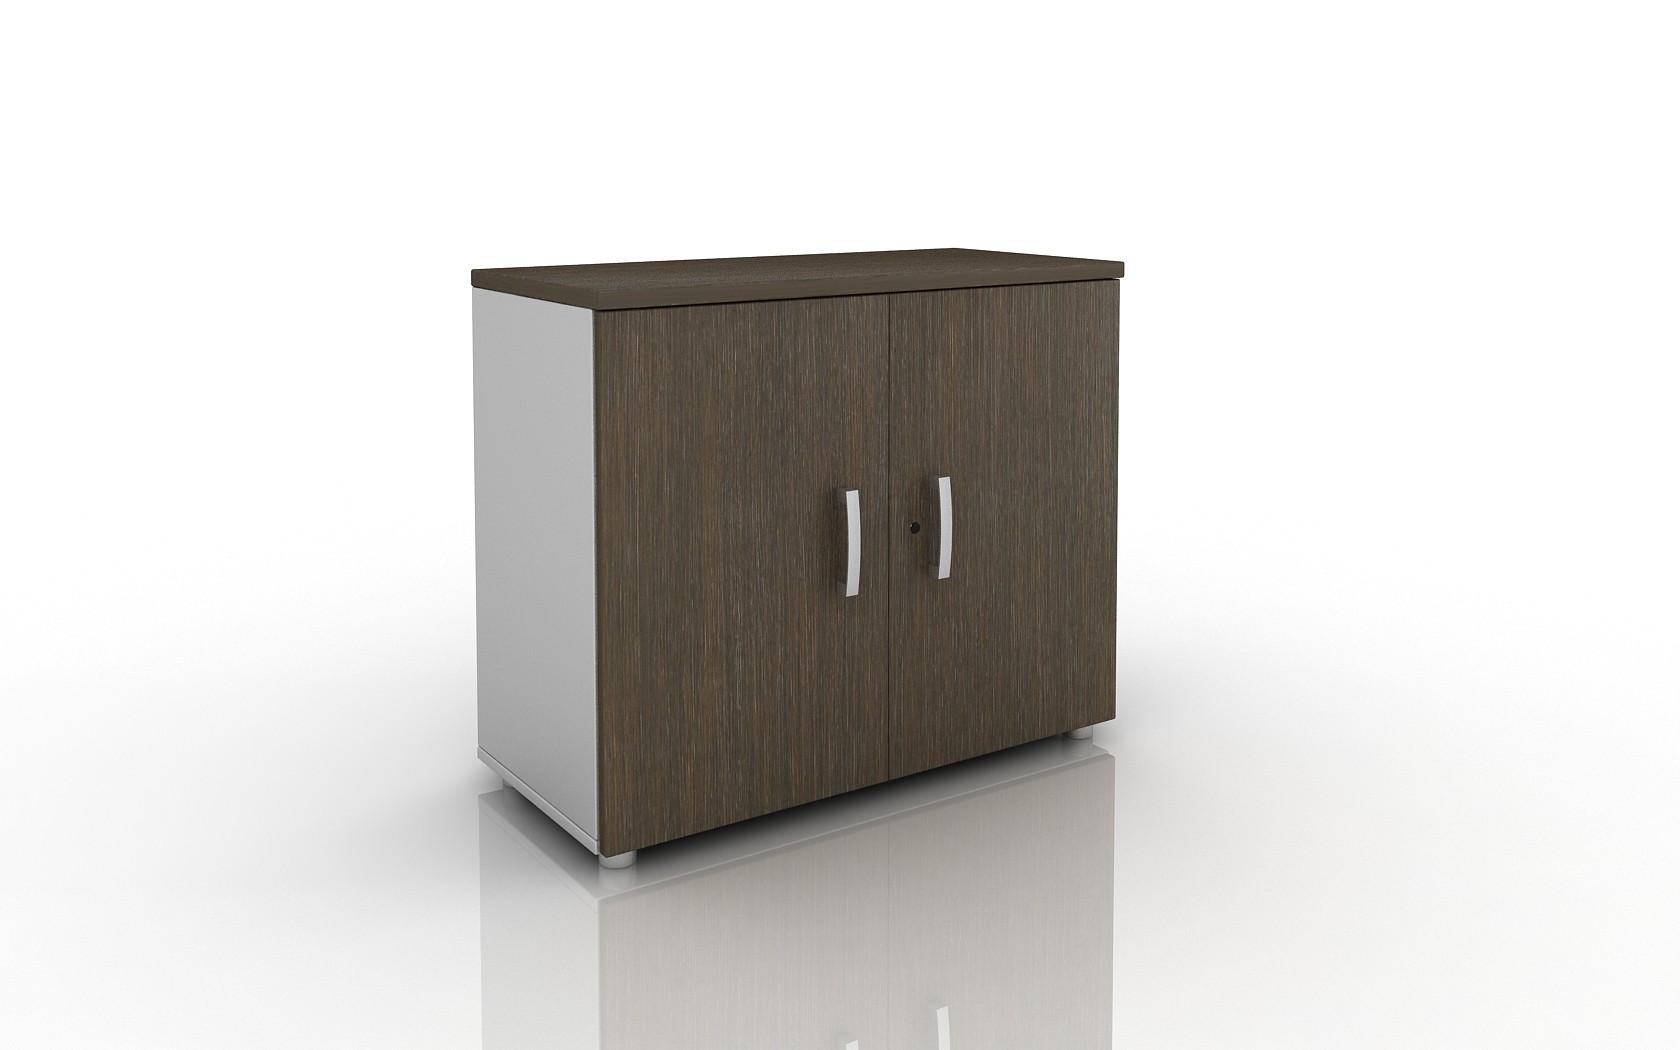 Peinture pour armoire bois perfect awesome hot armoire for Peindre armoire bois